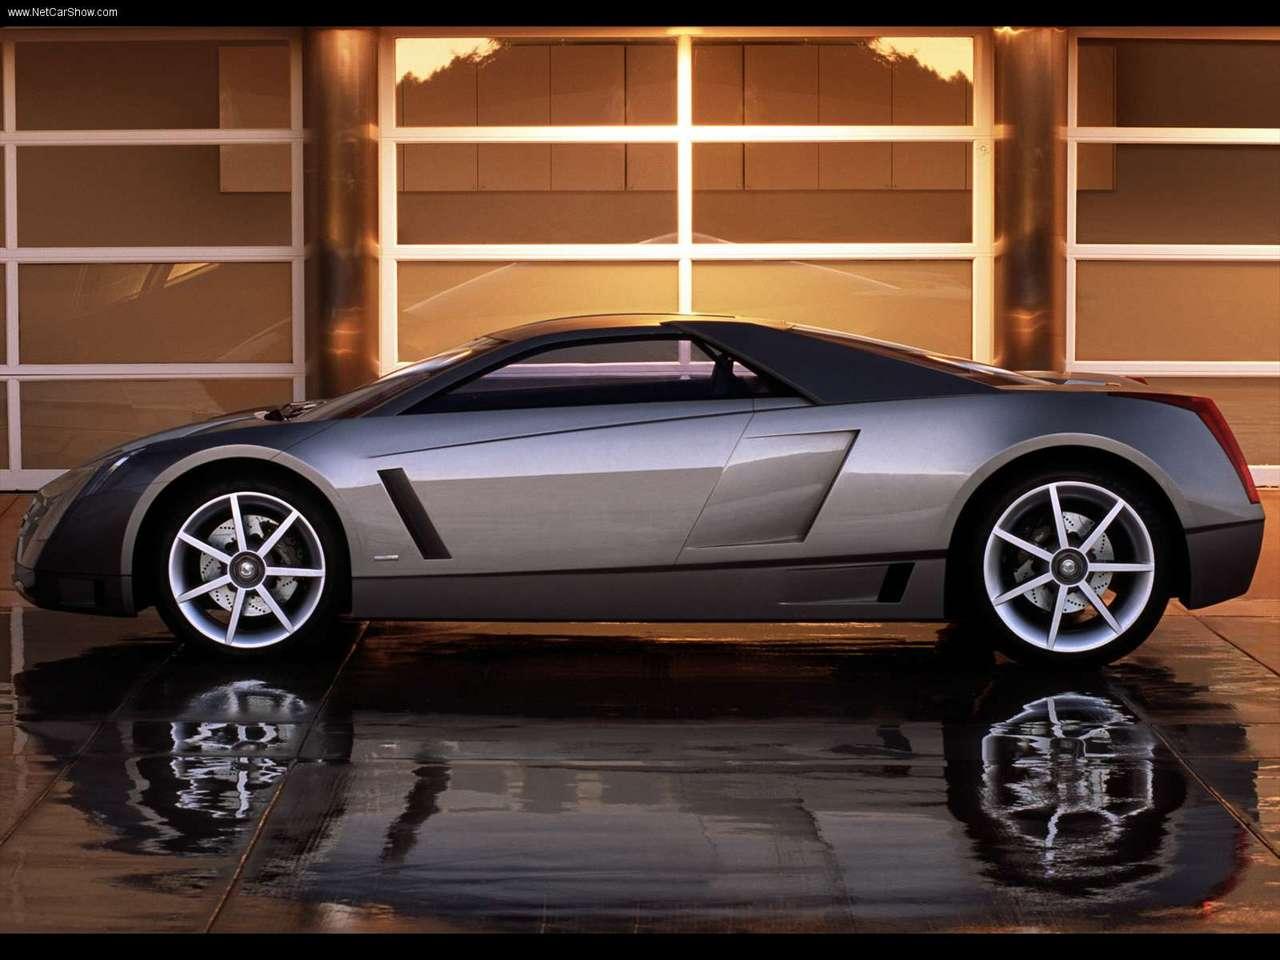 2002_Cadillac_Cien_Concept_1280x960_18.jpg